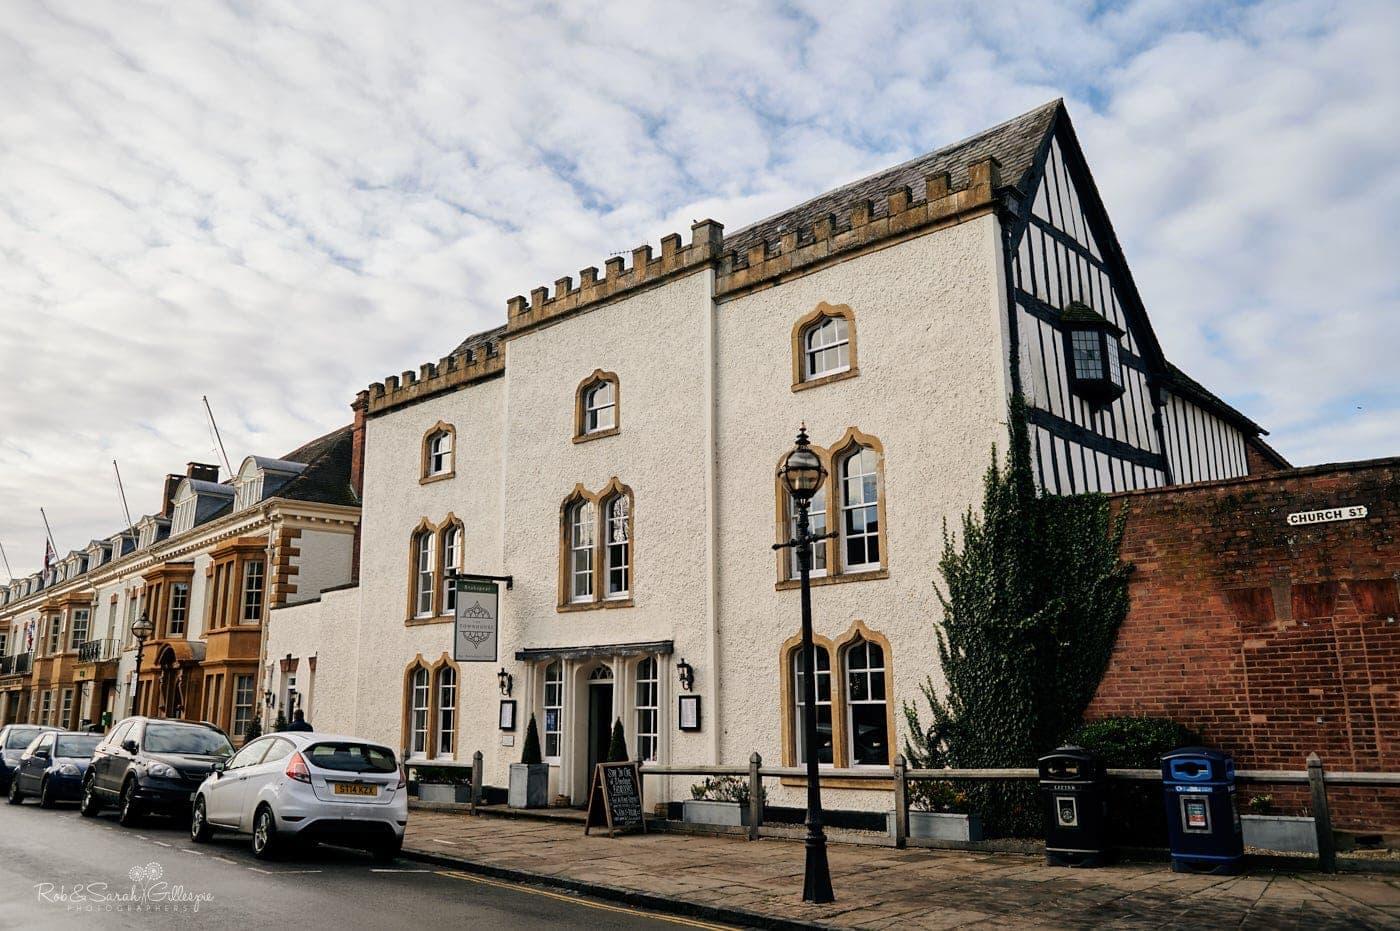 The Townhouse Hotel in Stratford-upon-Avon, Warwickshire